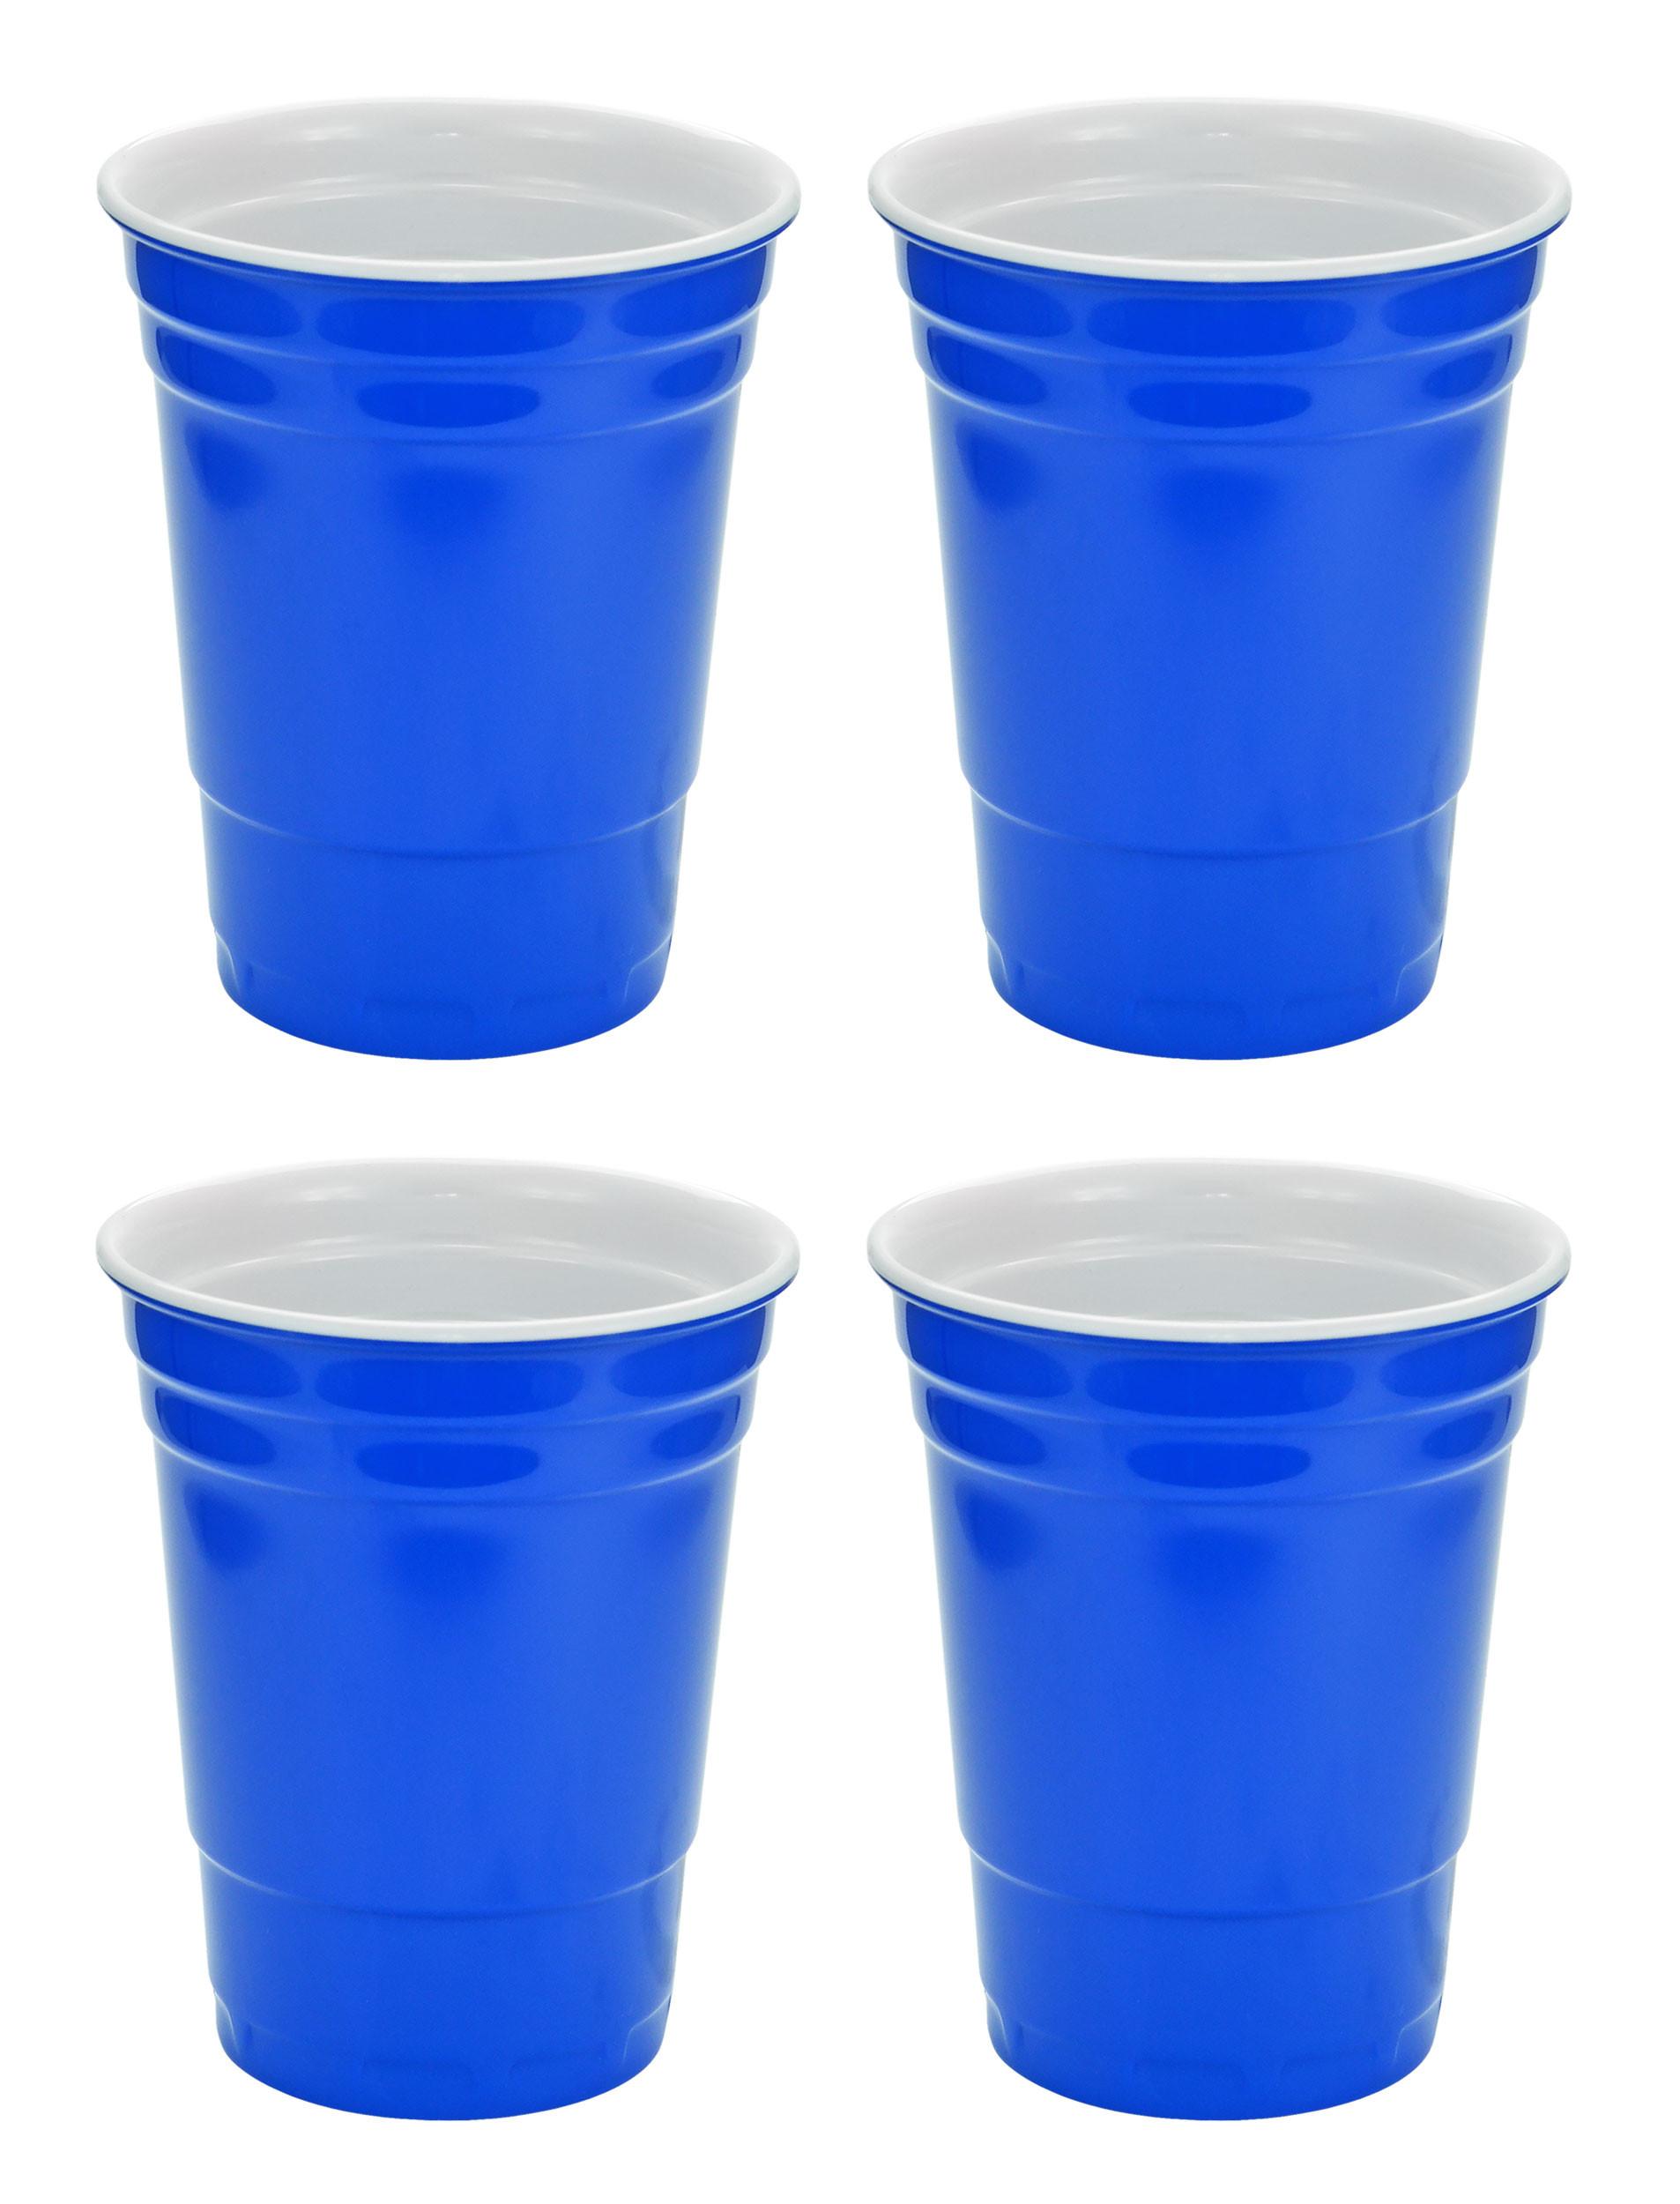 Blue Hard Plastic Cup 16oz - 4 Pack